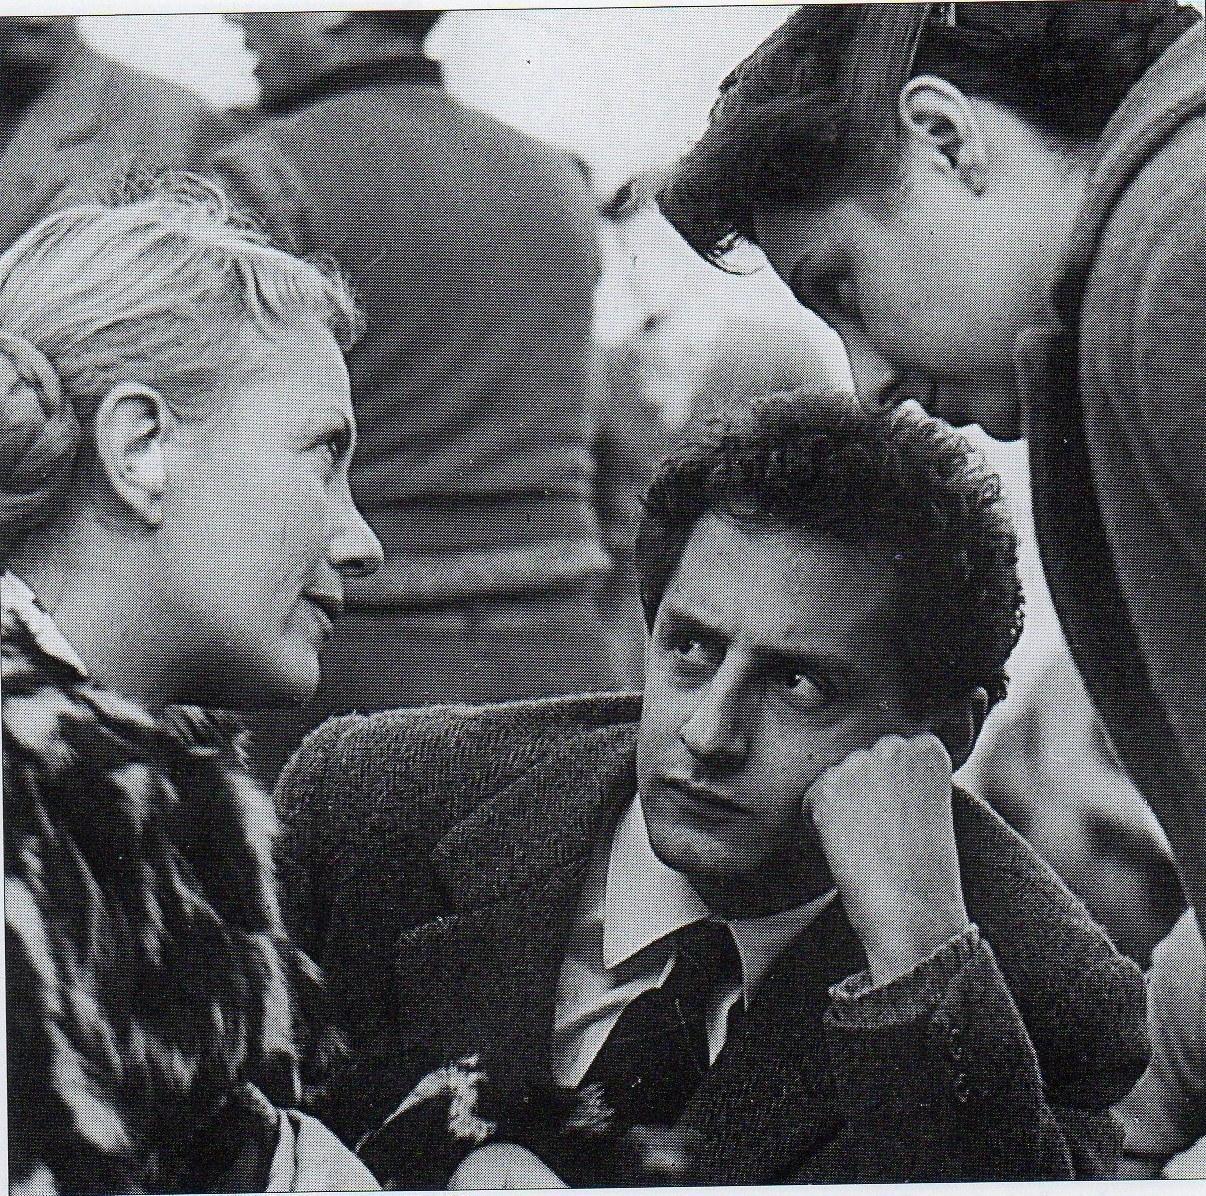 Isa Miranda, Francesco Maselli e Goliarda Sapienza sul set de Gli sbandati (1955) © Archivio Sapienza Pellegrino